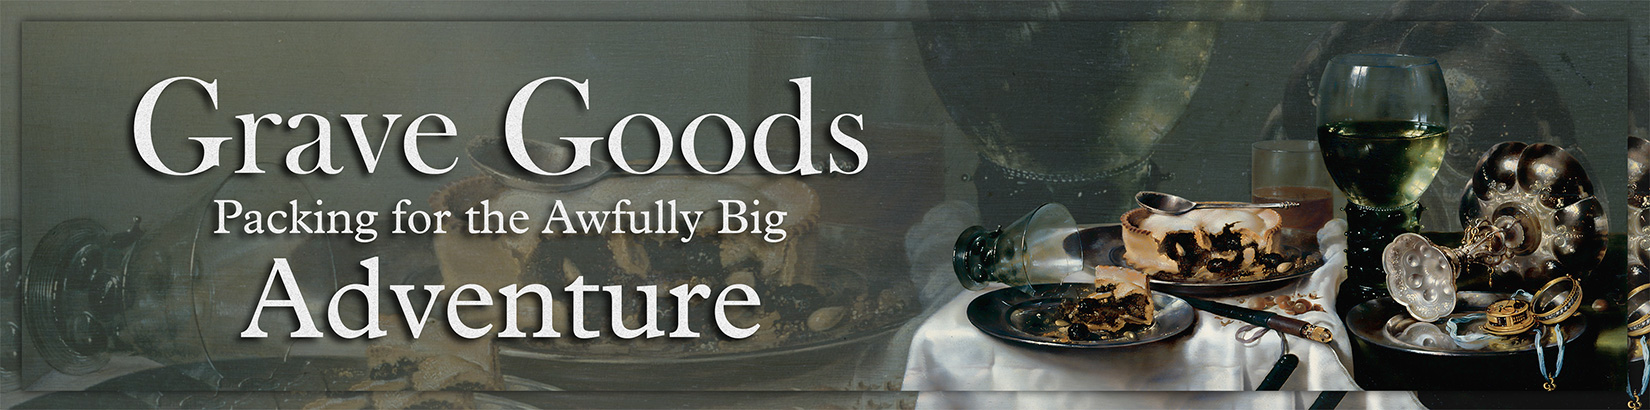 grave-goods-header